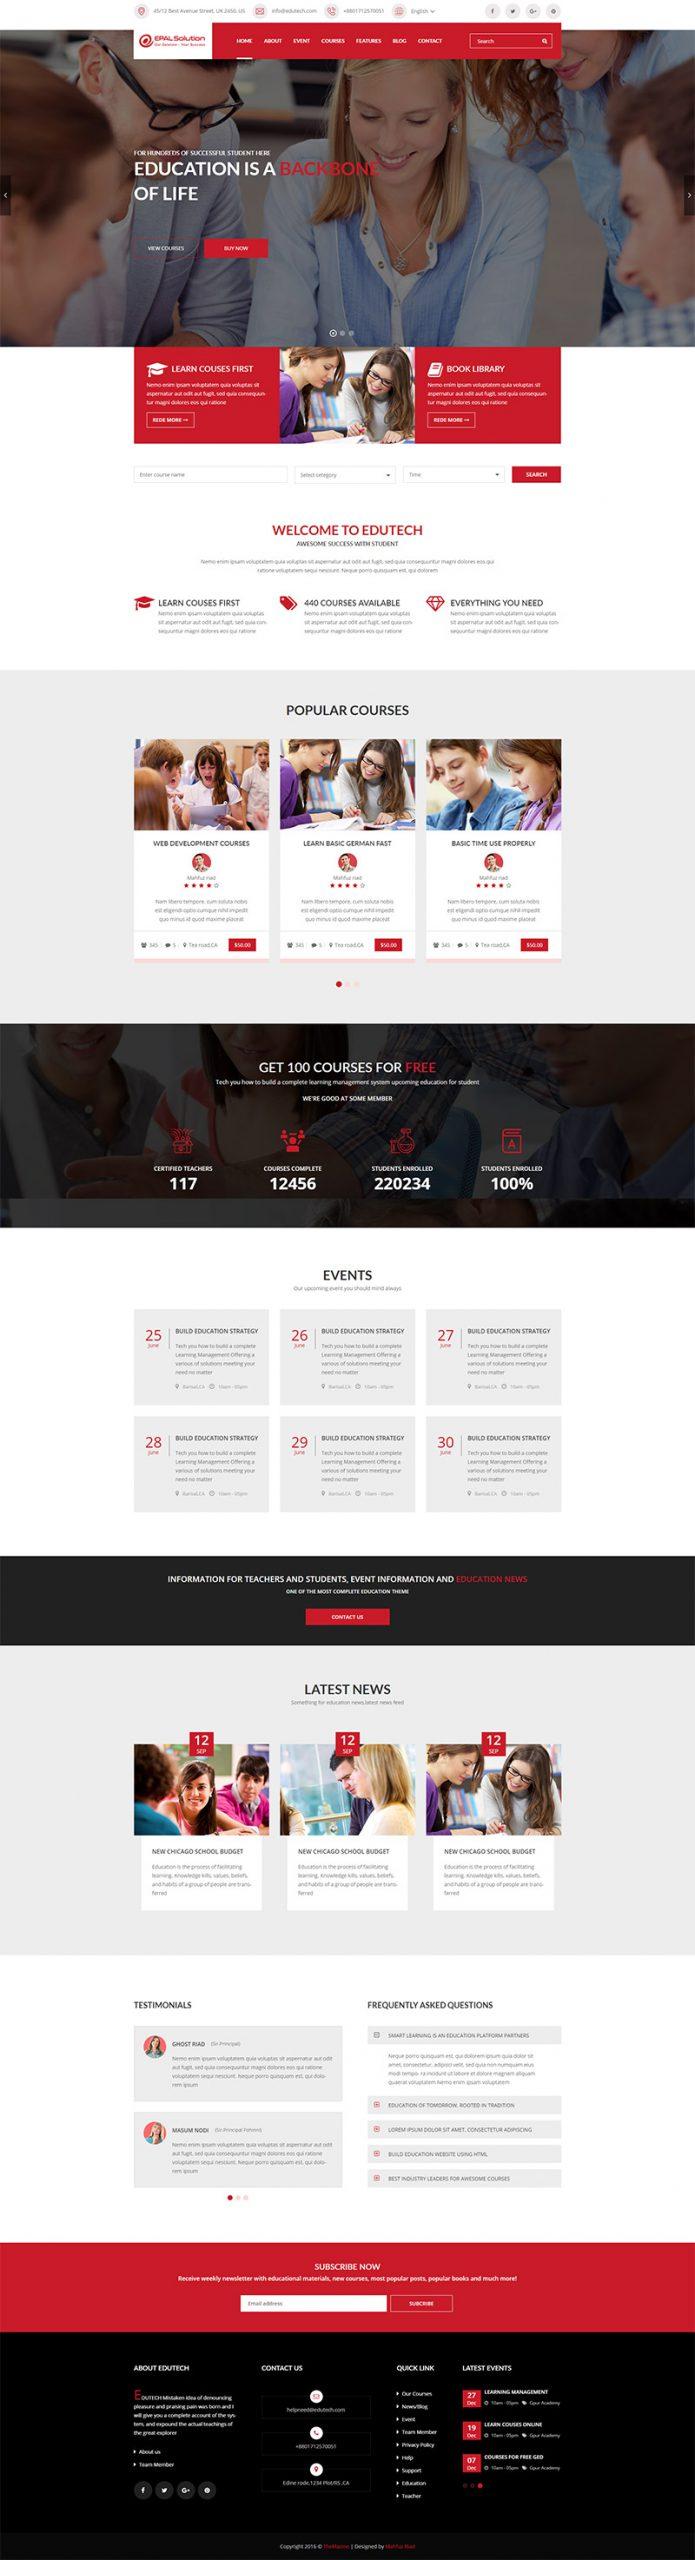 Giao Diện Website Giáo Dục Edutech